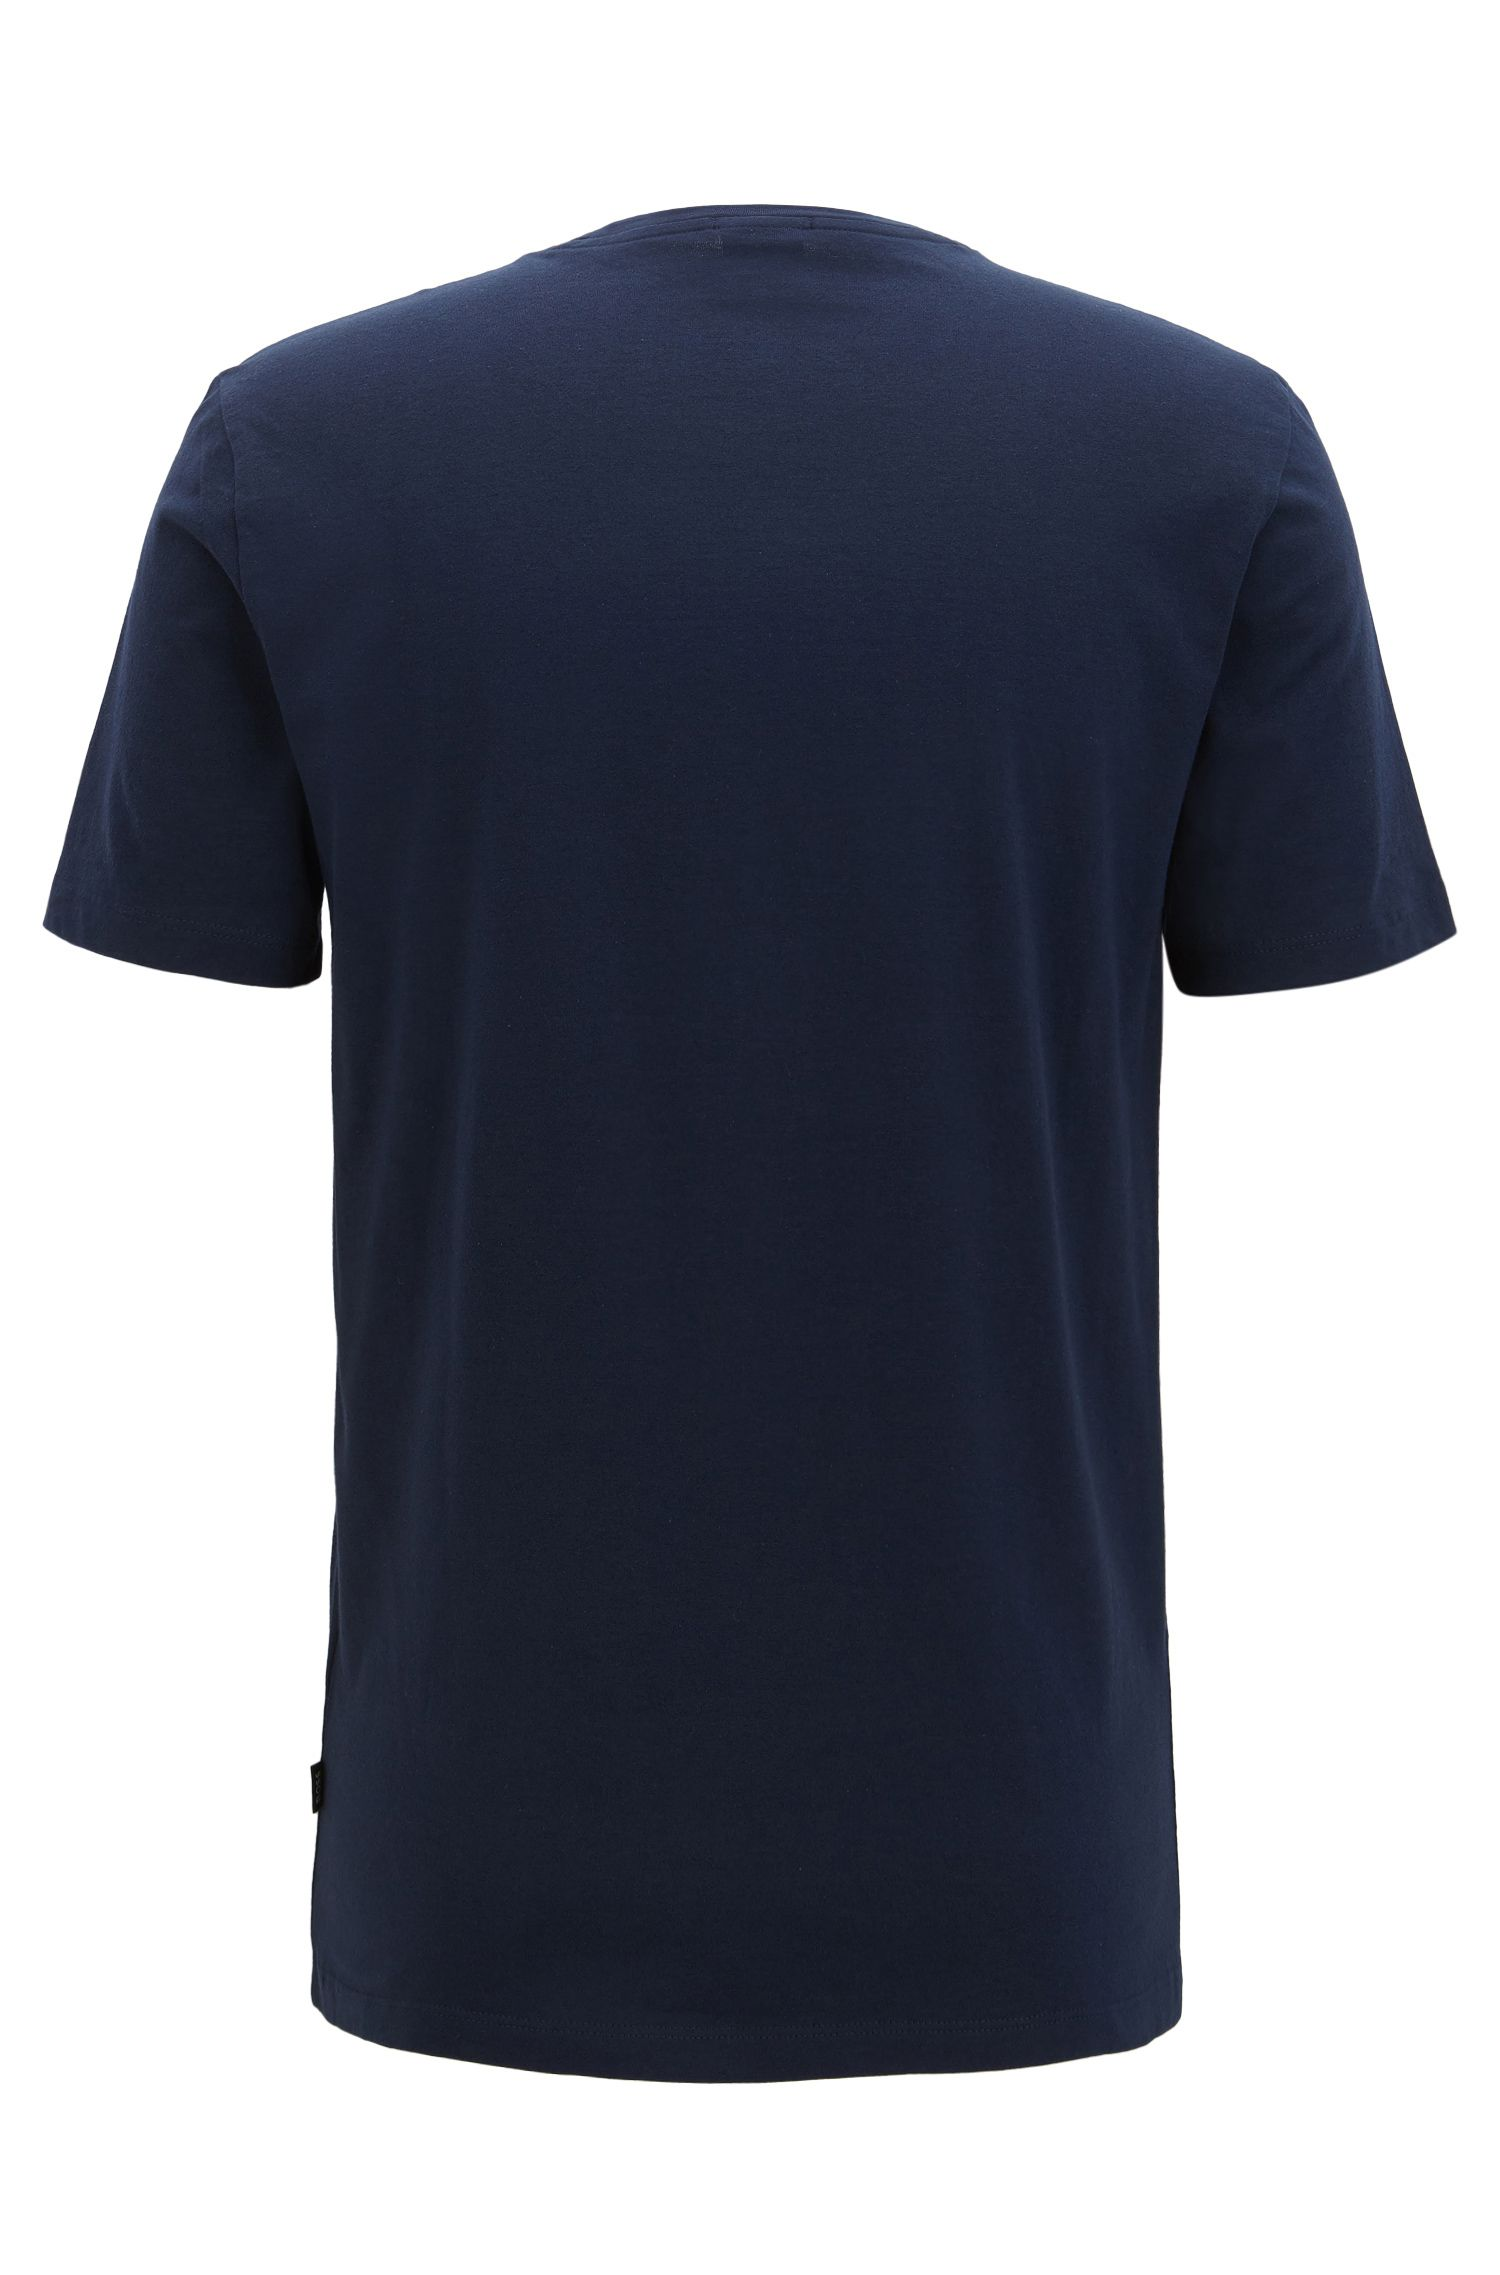 Camiseta slim fit estampada en algodón Pima